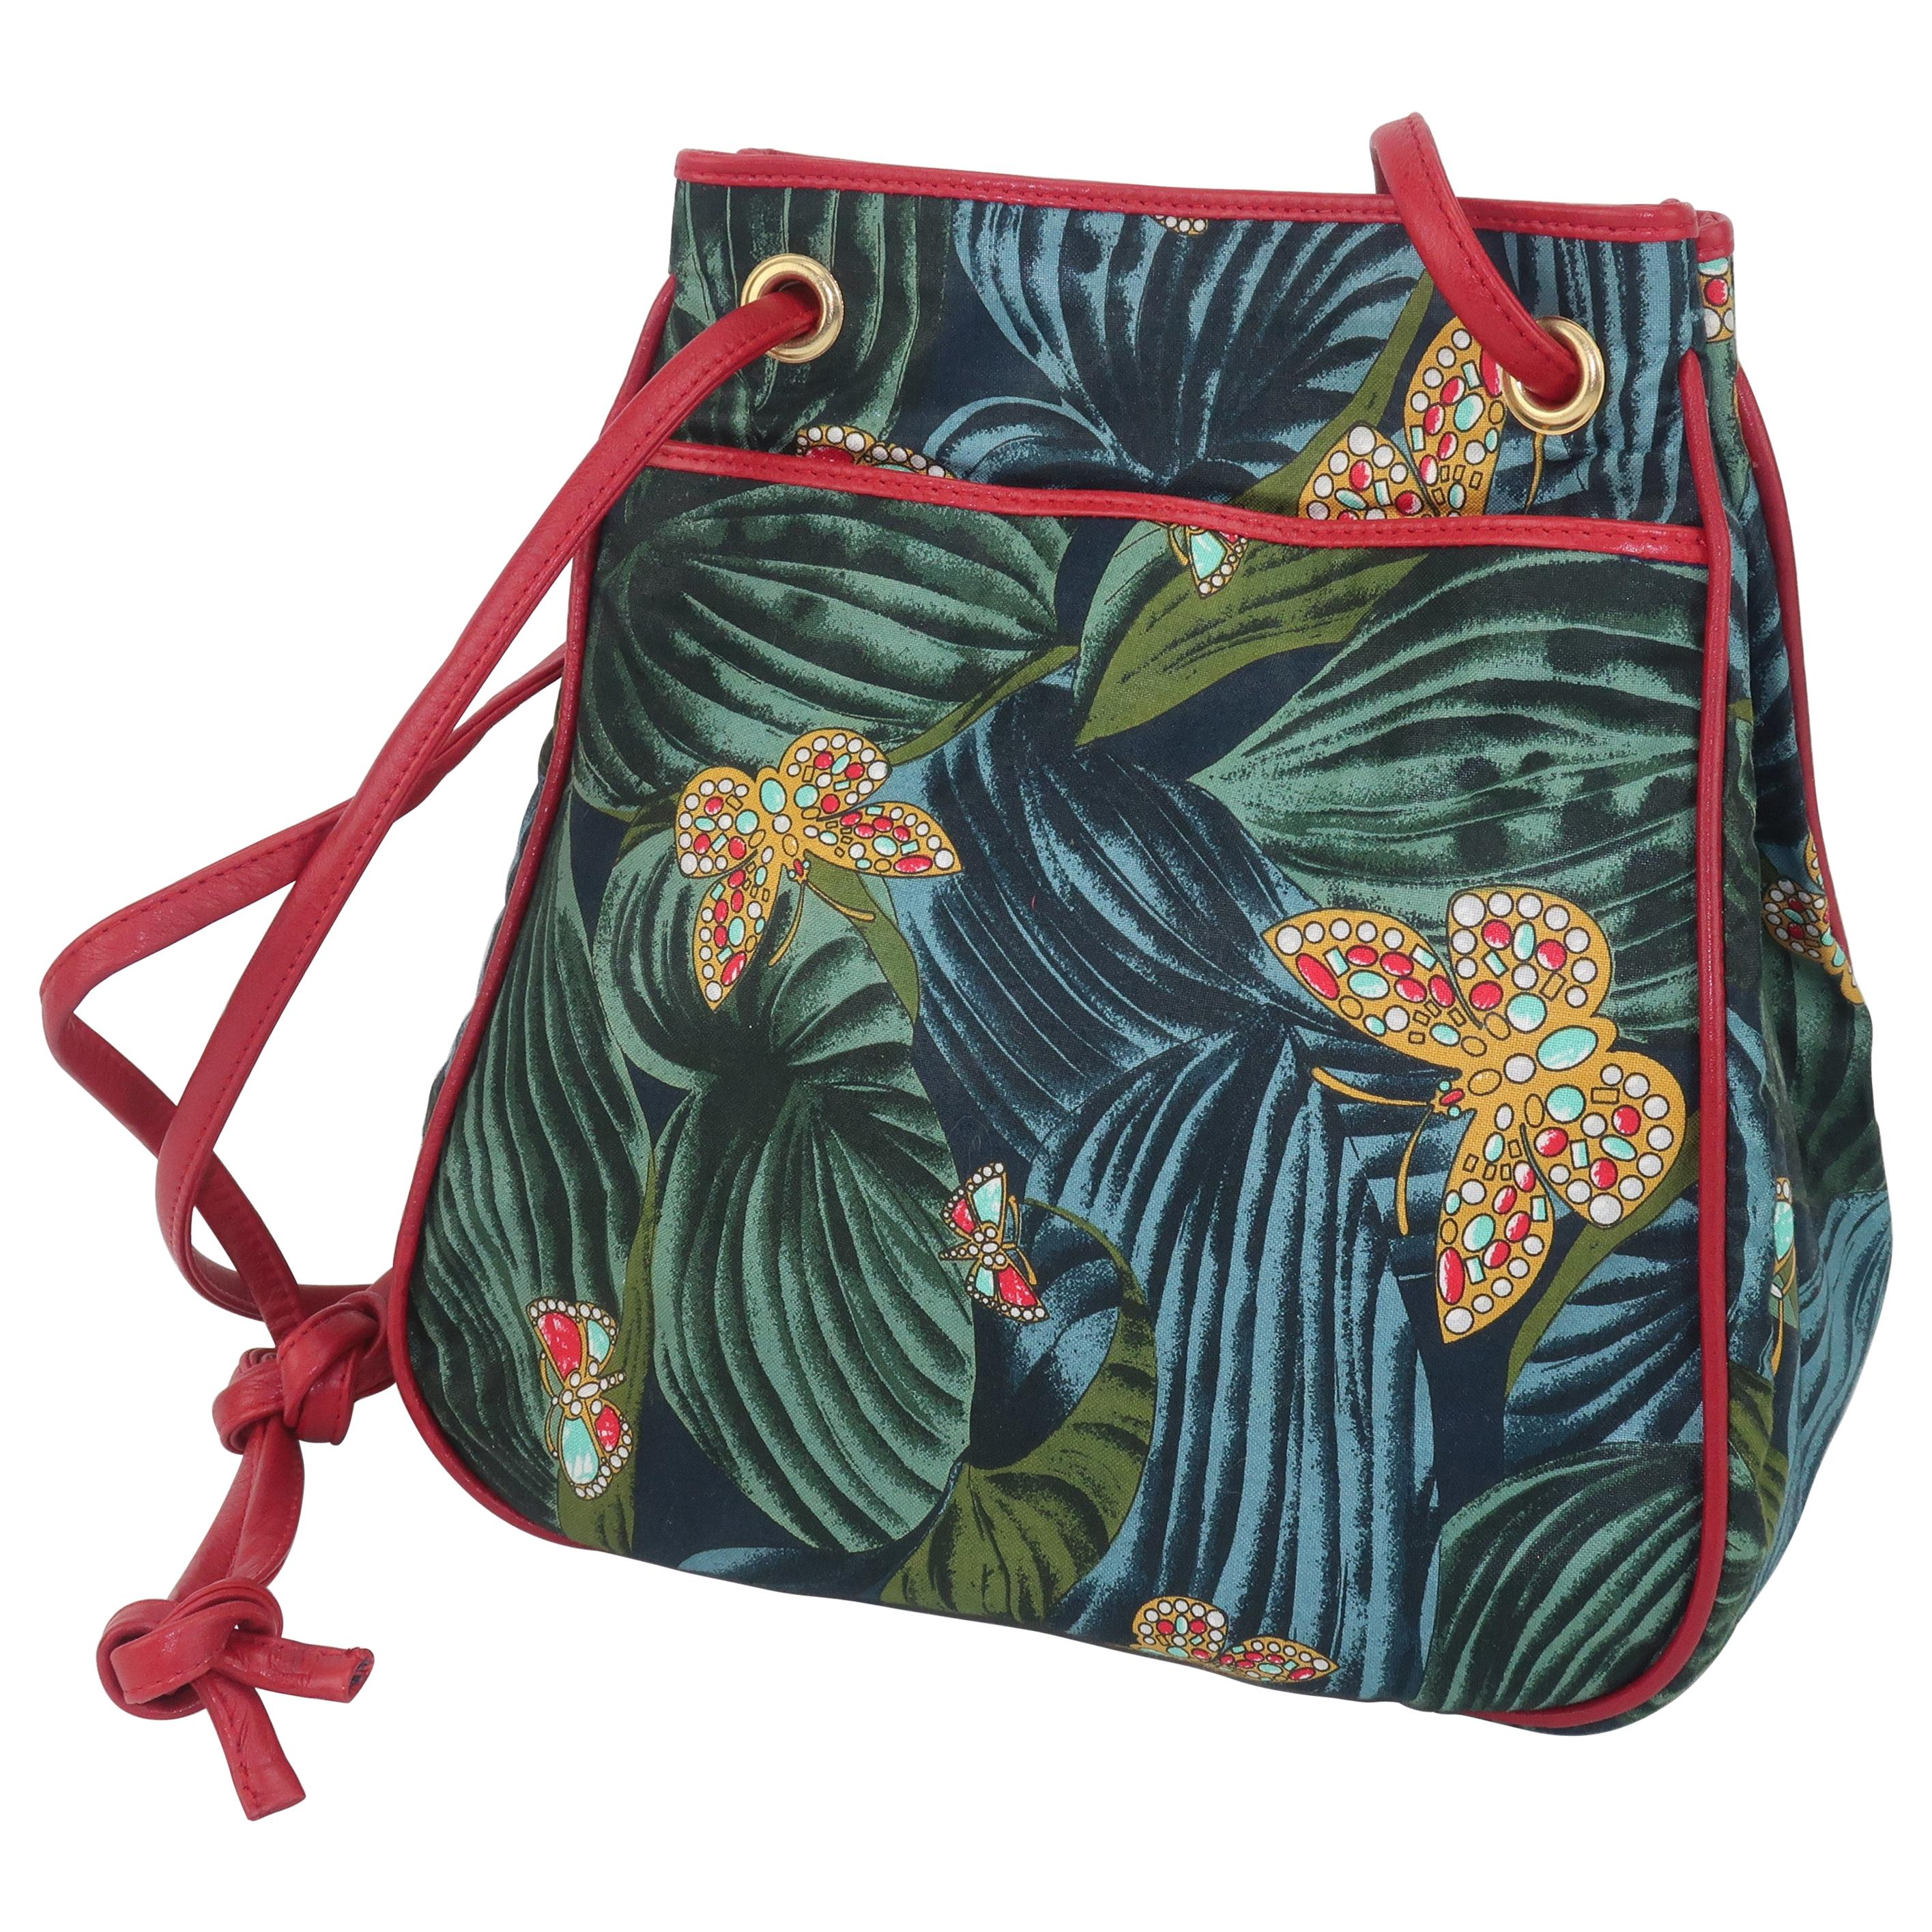 Bottega Veneta Butterfly Fabric & Red Leather Handbag, 1970's